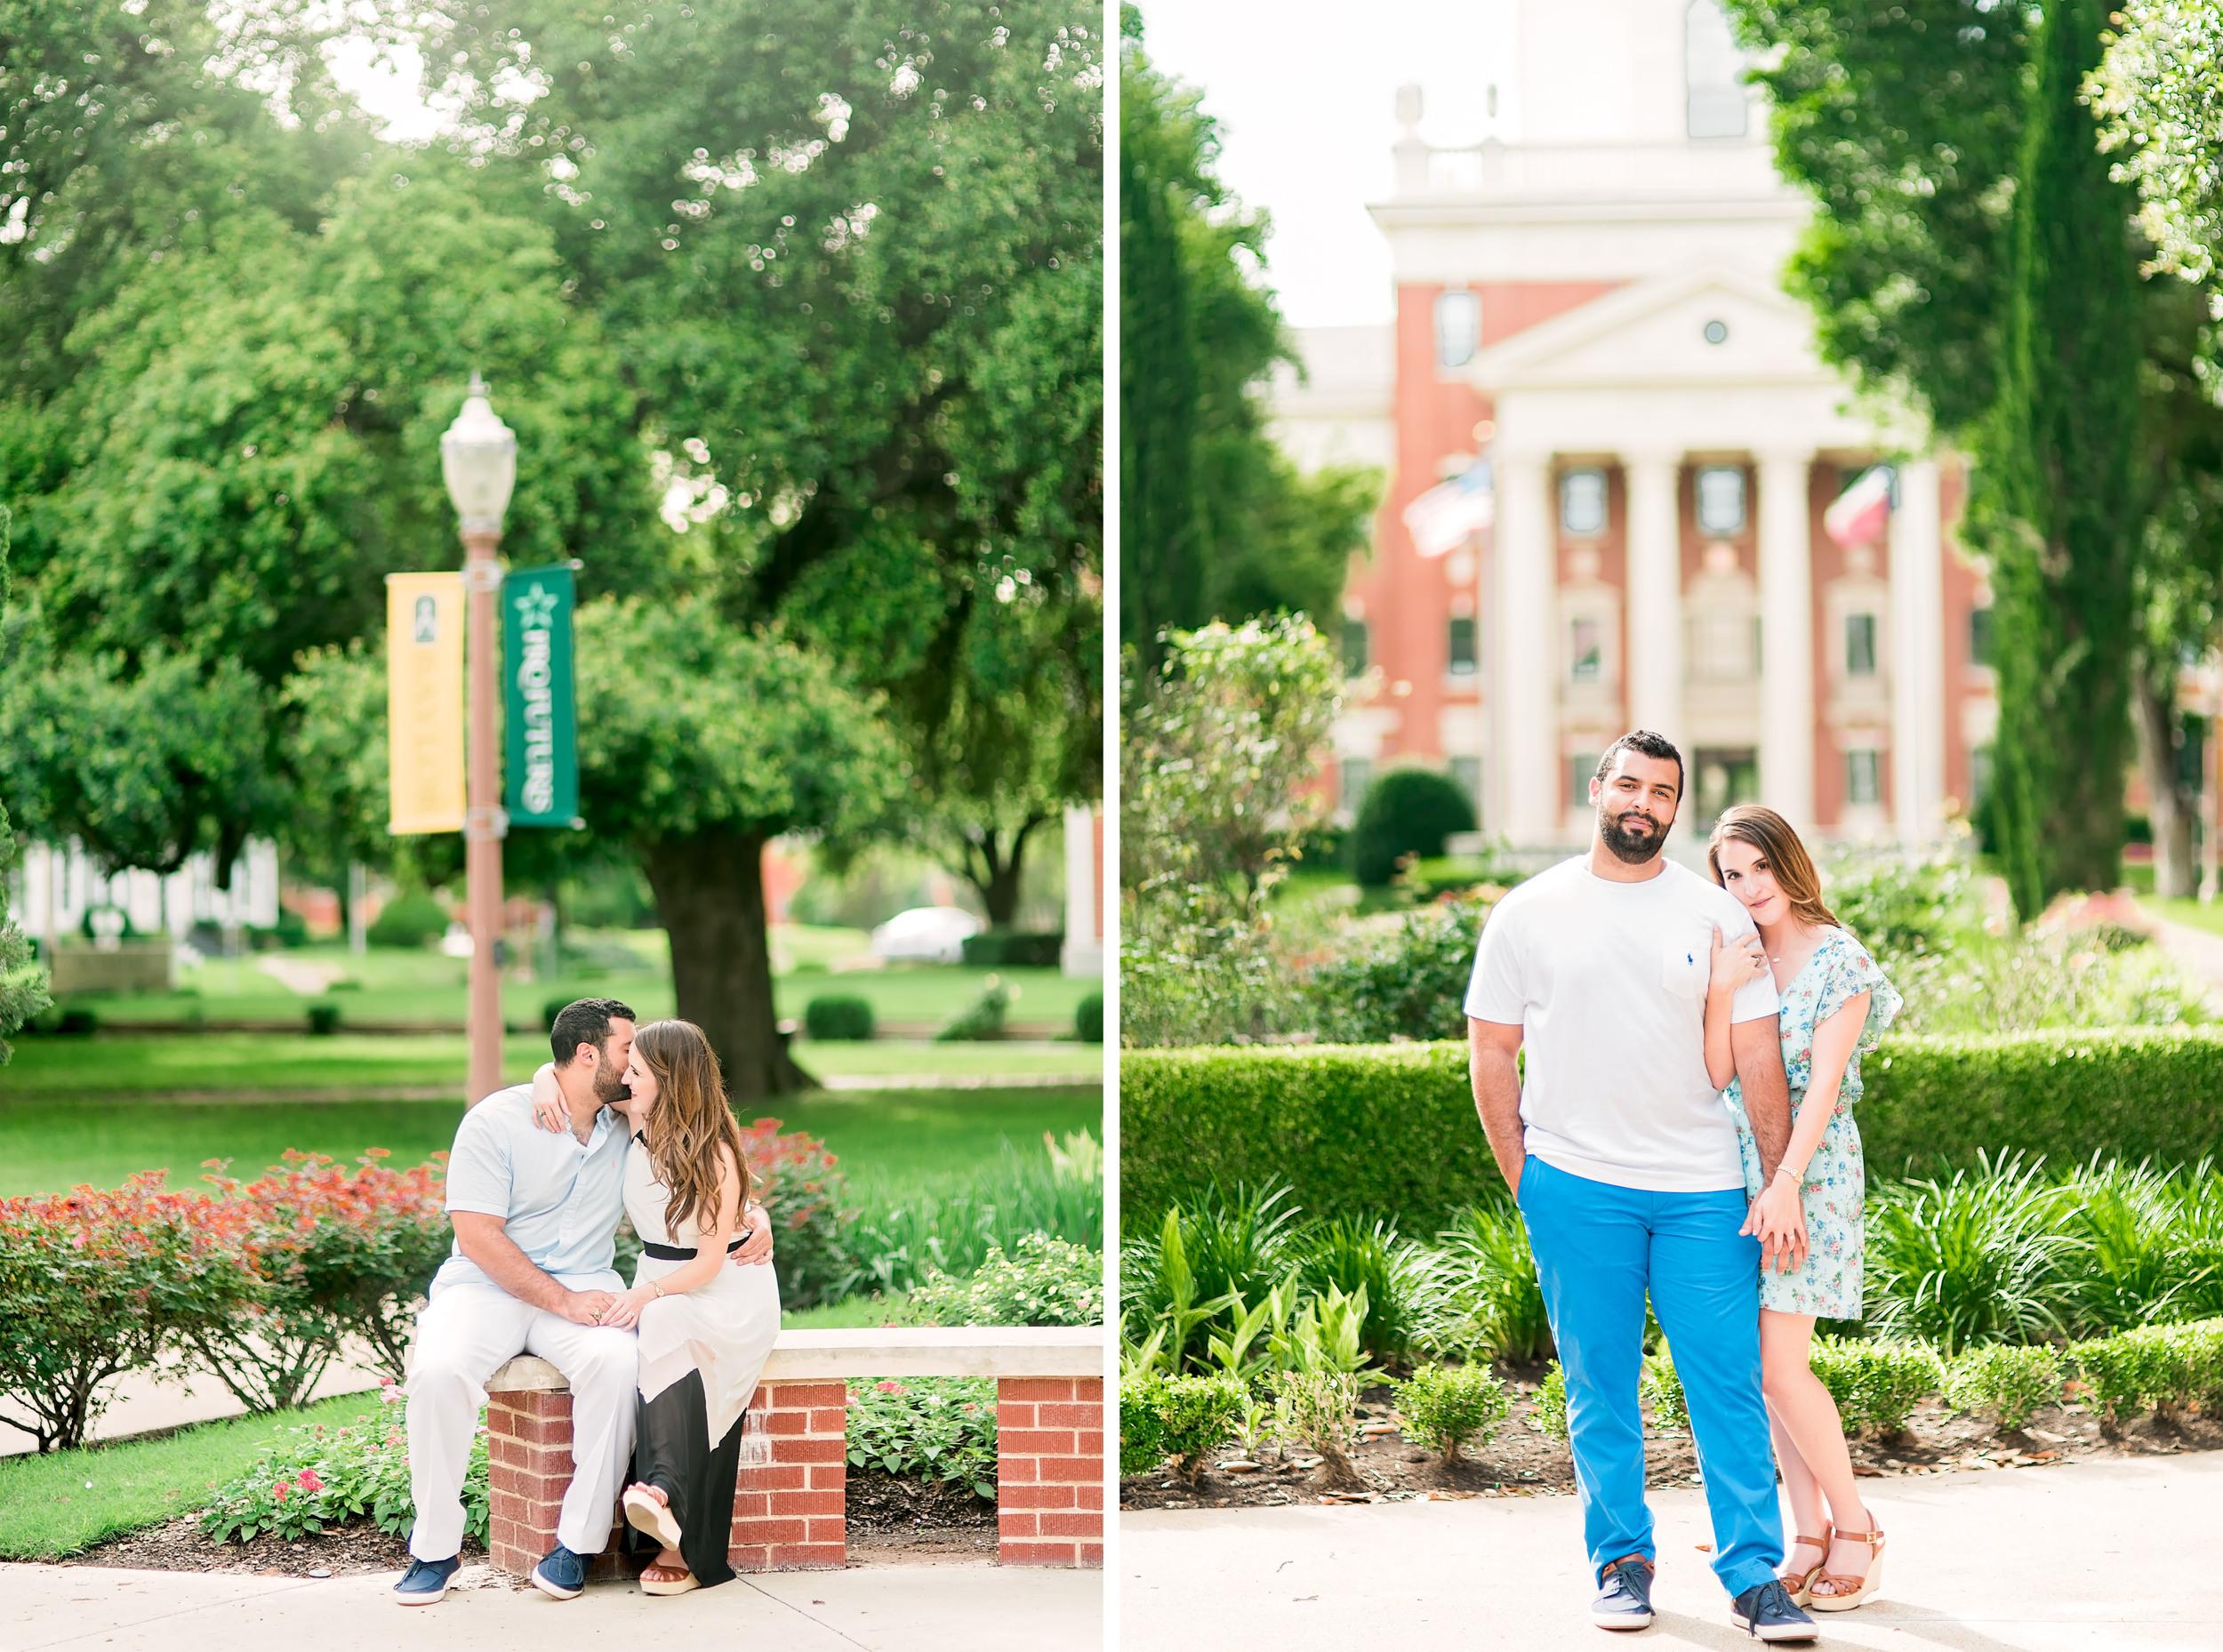 Engagement Session- Pharris Photography- Texas Photographer- Rosie and John